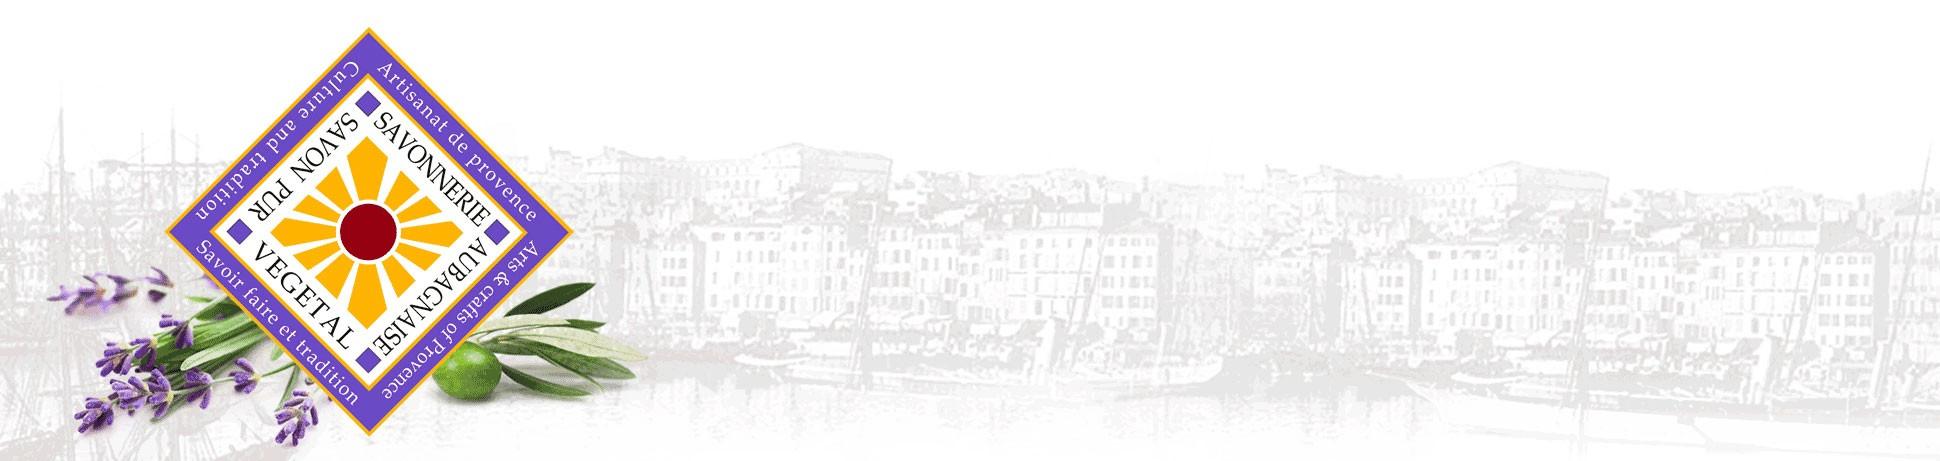 Artisanat en provence